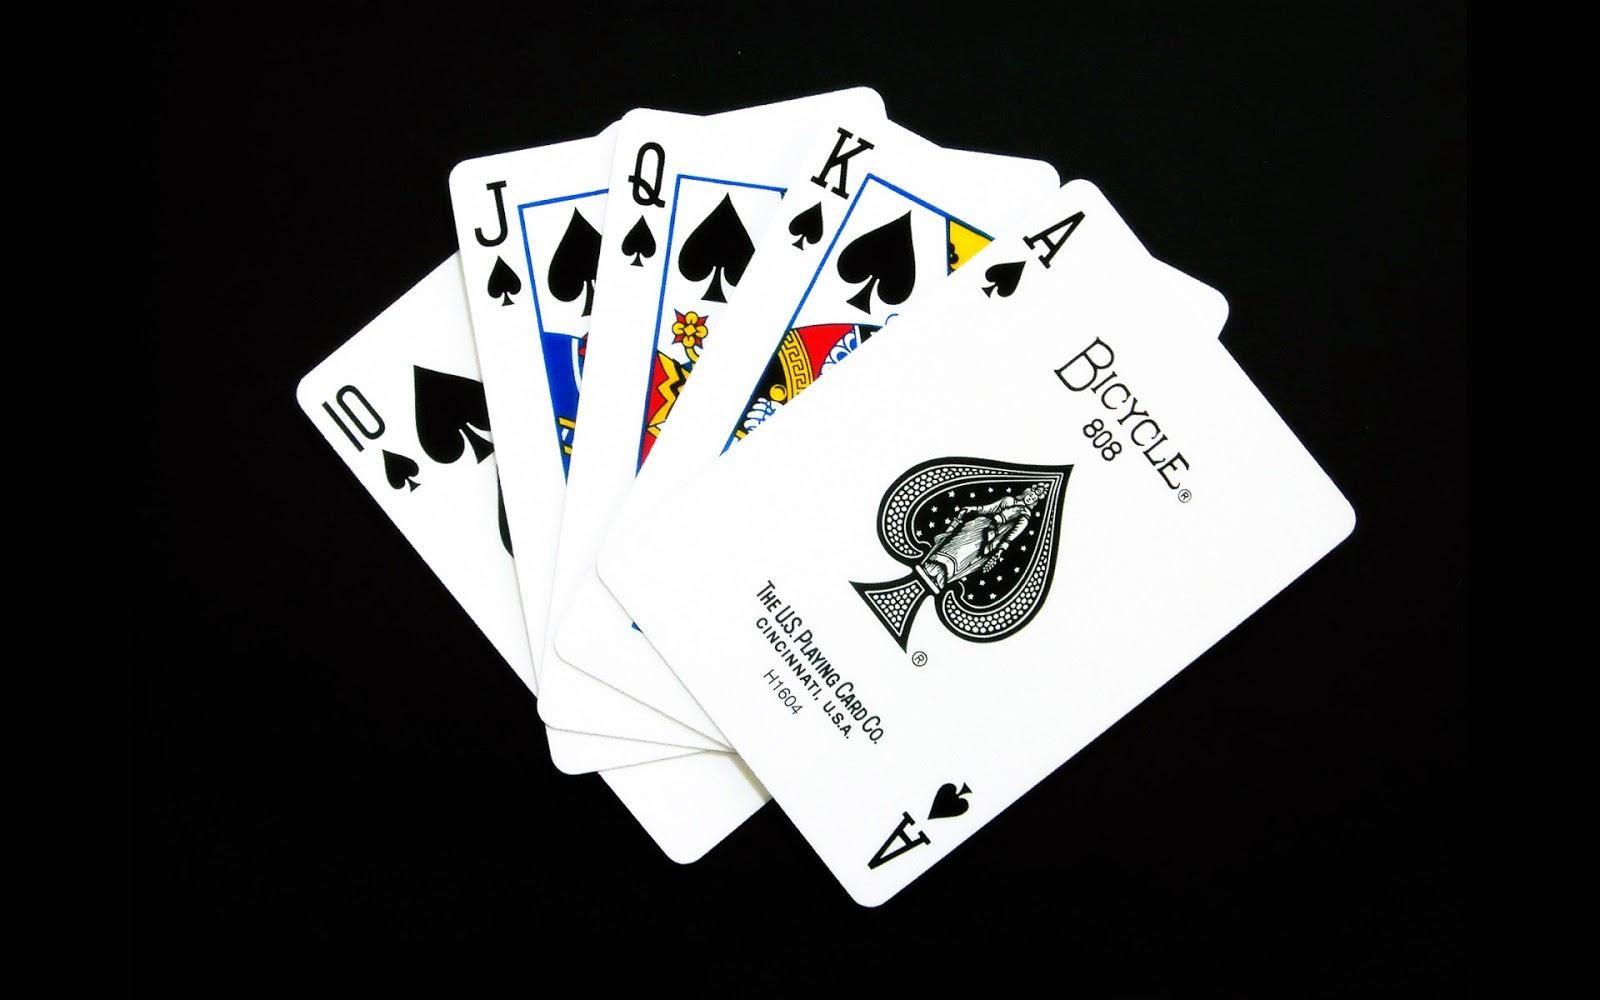 Passu diary october 2013 - Poker wallpaper ...